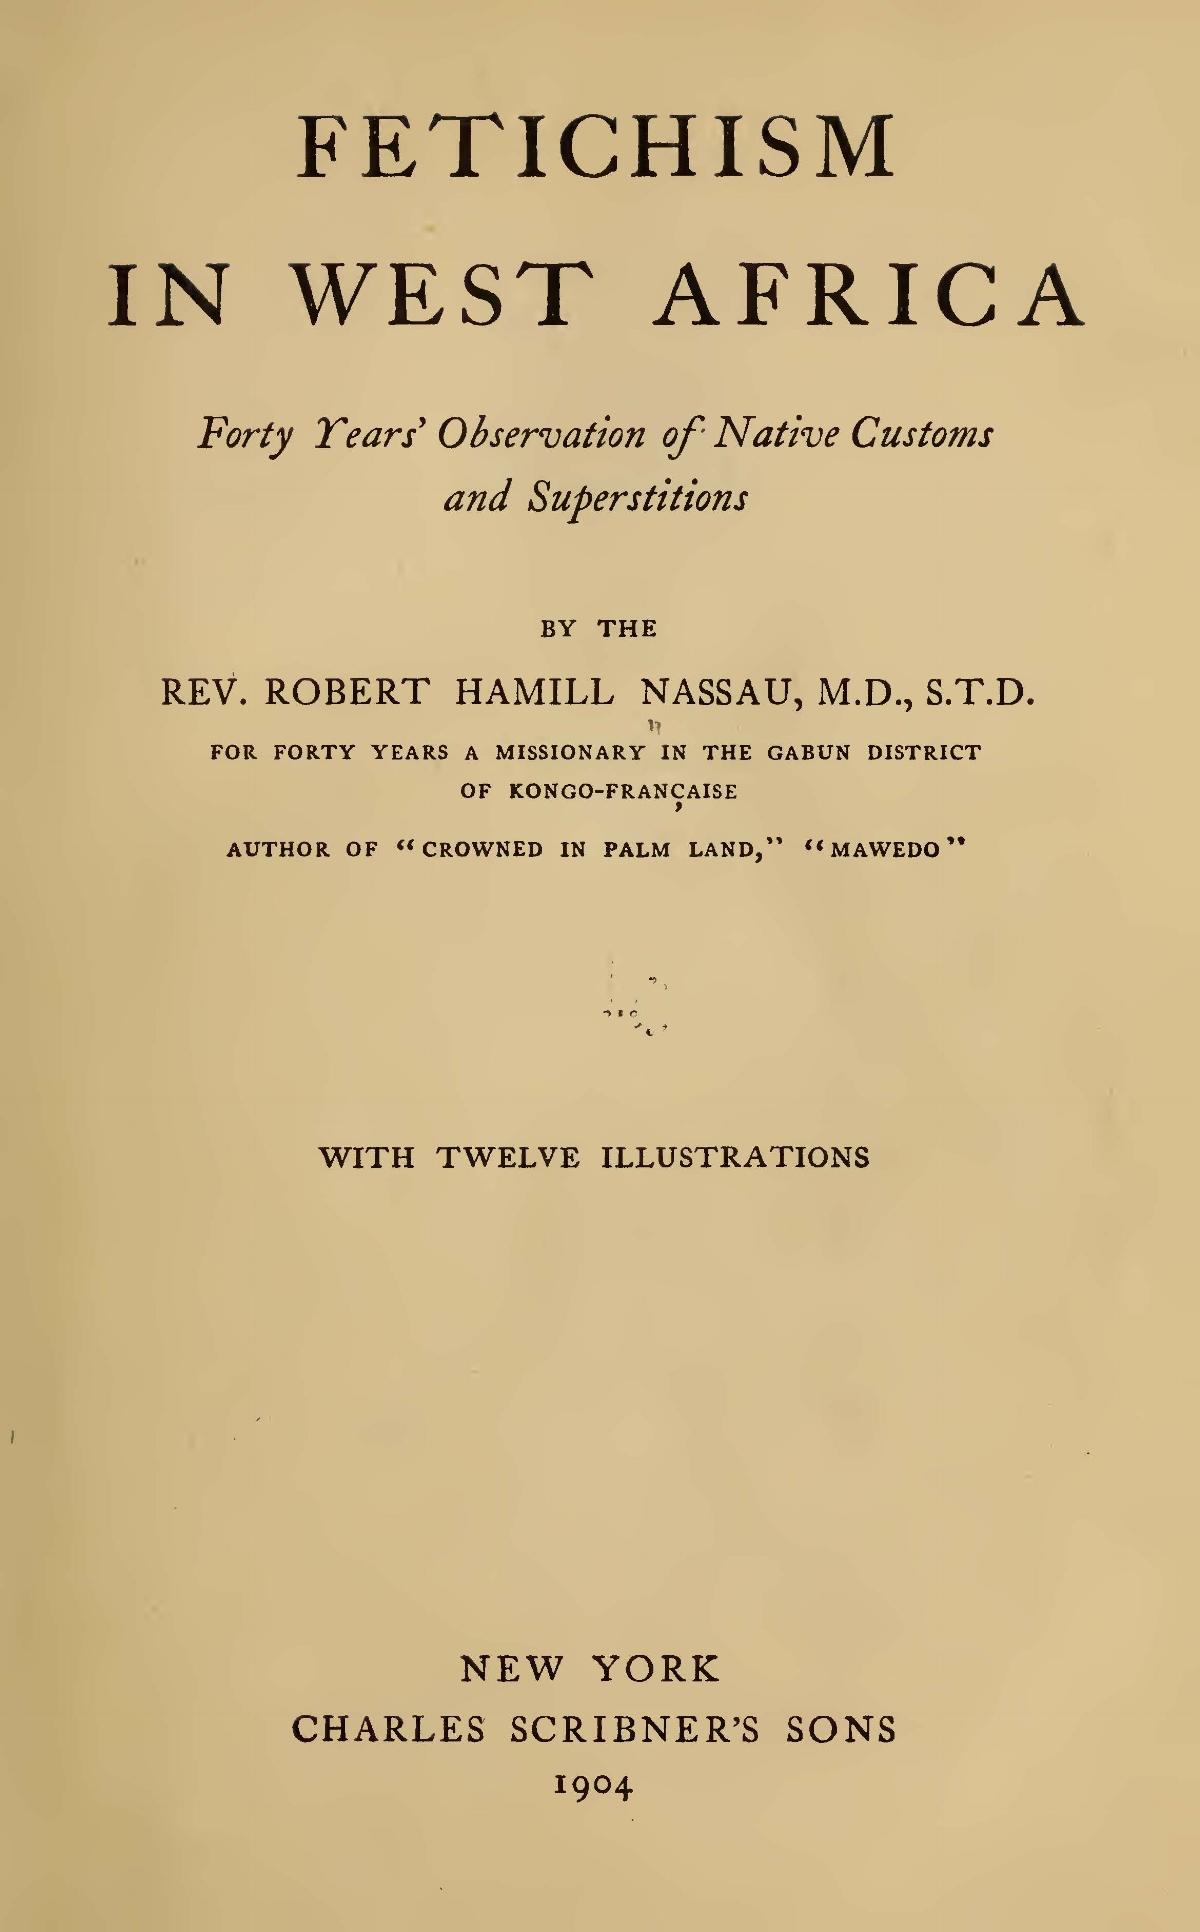 Nassau, Robert Hamill, Fetichism in West Africa Title Page.jpg